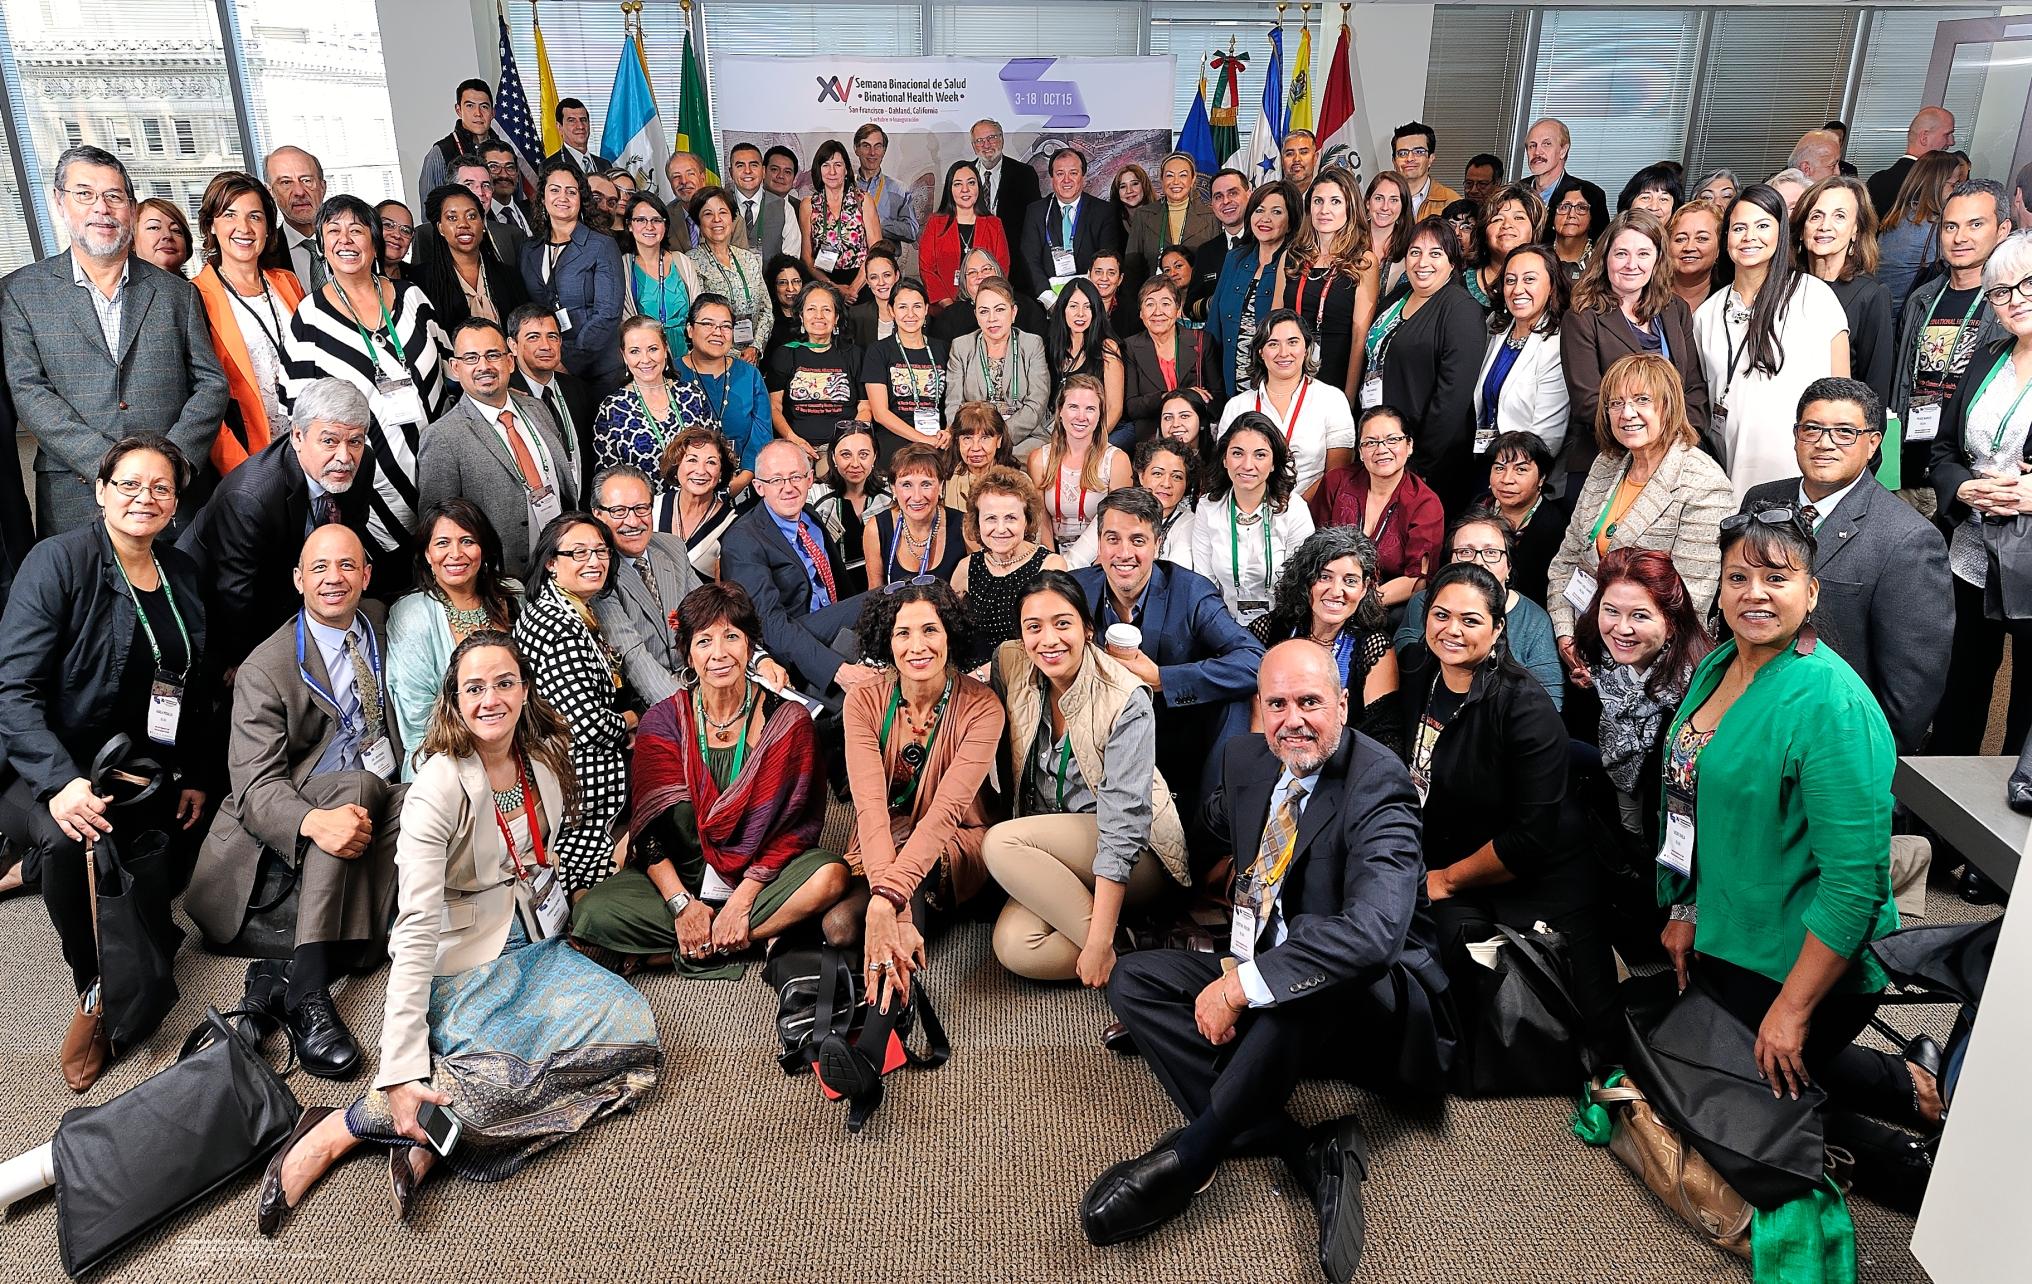 15th ANNUAL hEALTH WEEK CELEBRATION, SAN FRANCISCO AND OAKLAND CA.